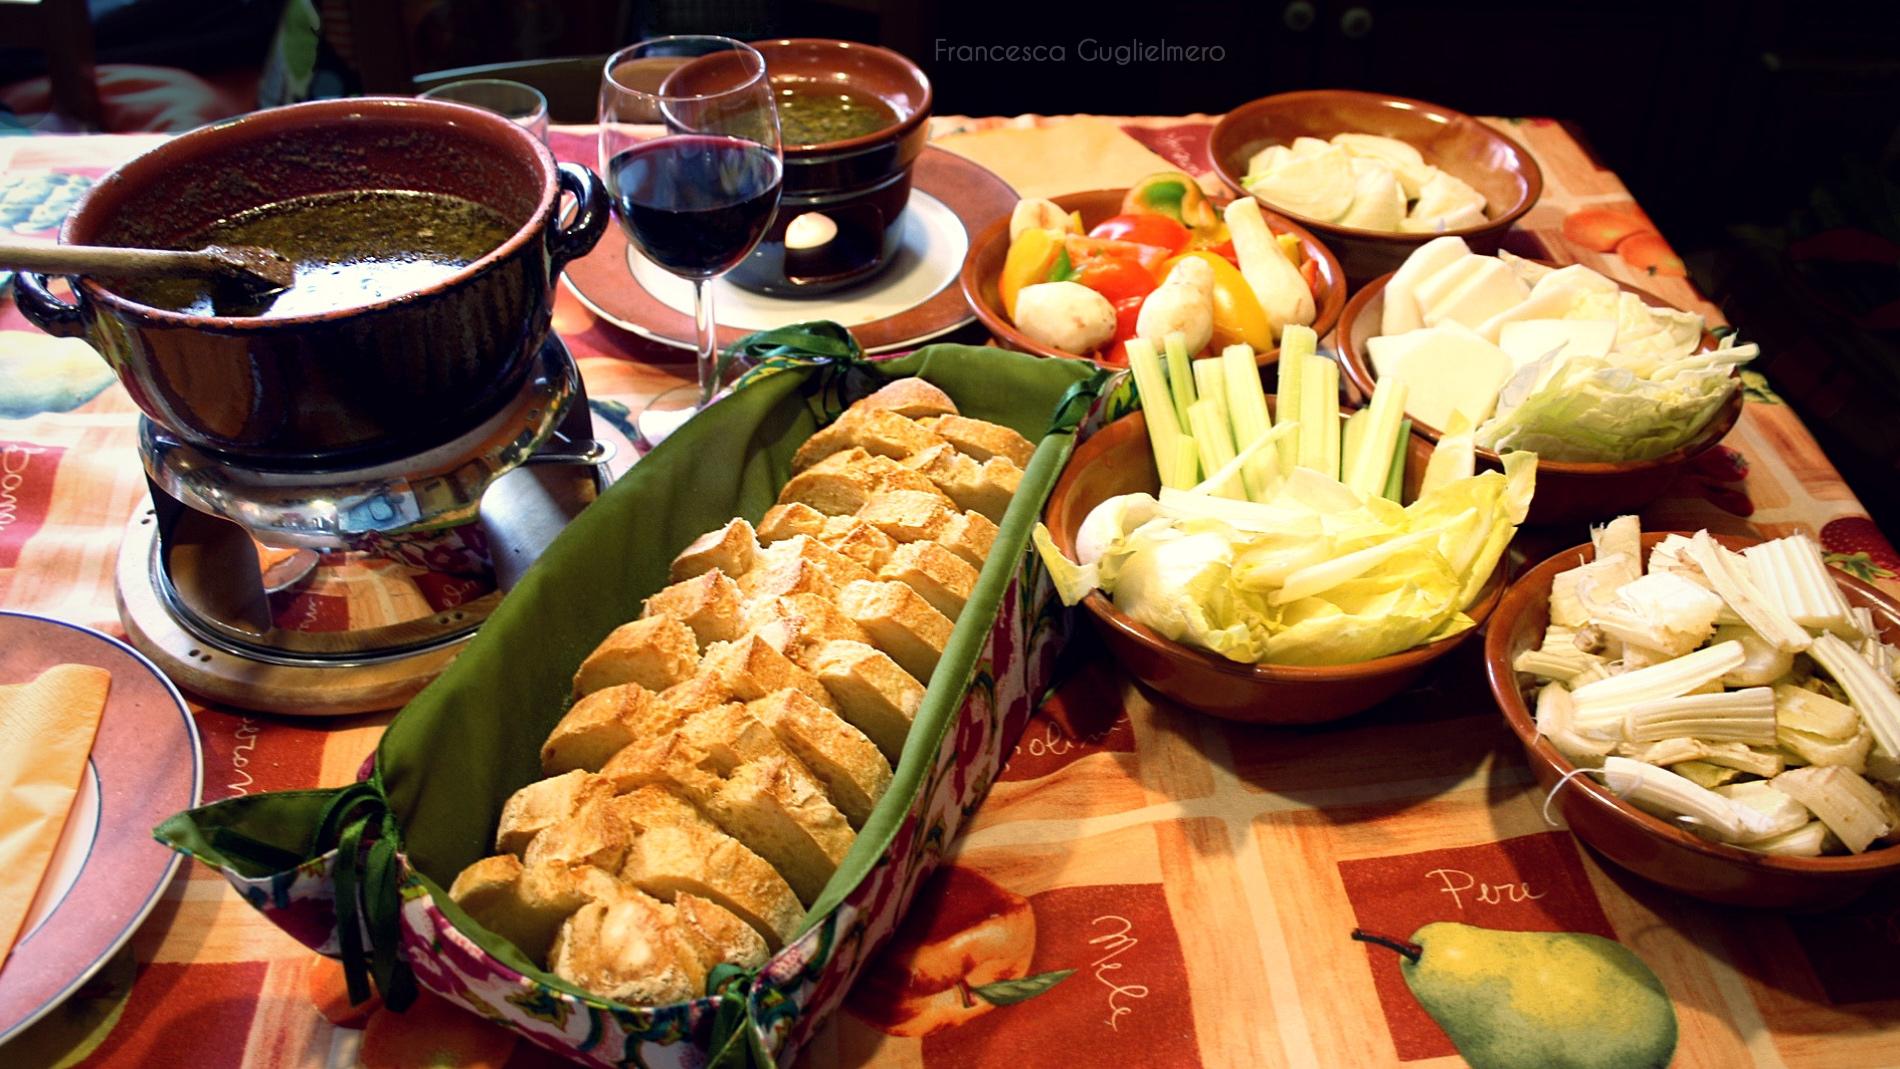 Bagna cauda ricetta tradizionale origine e storia